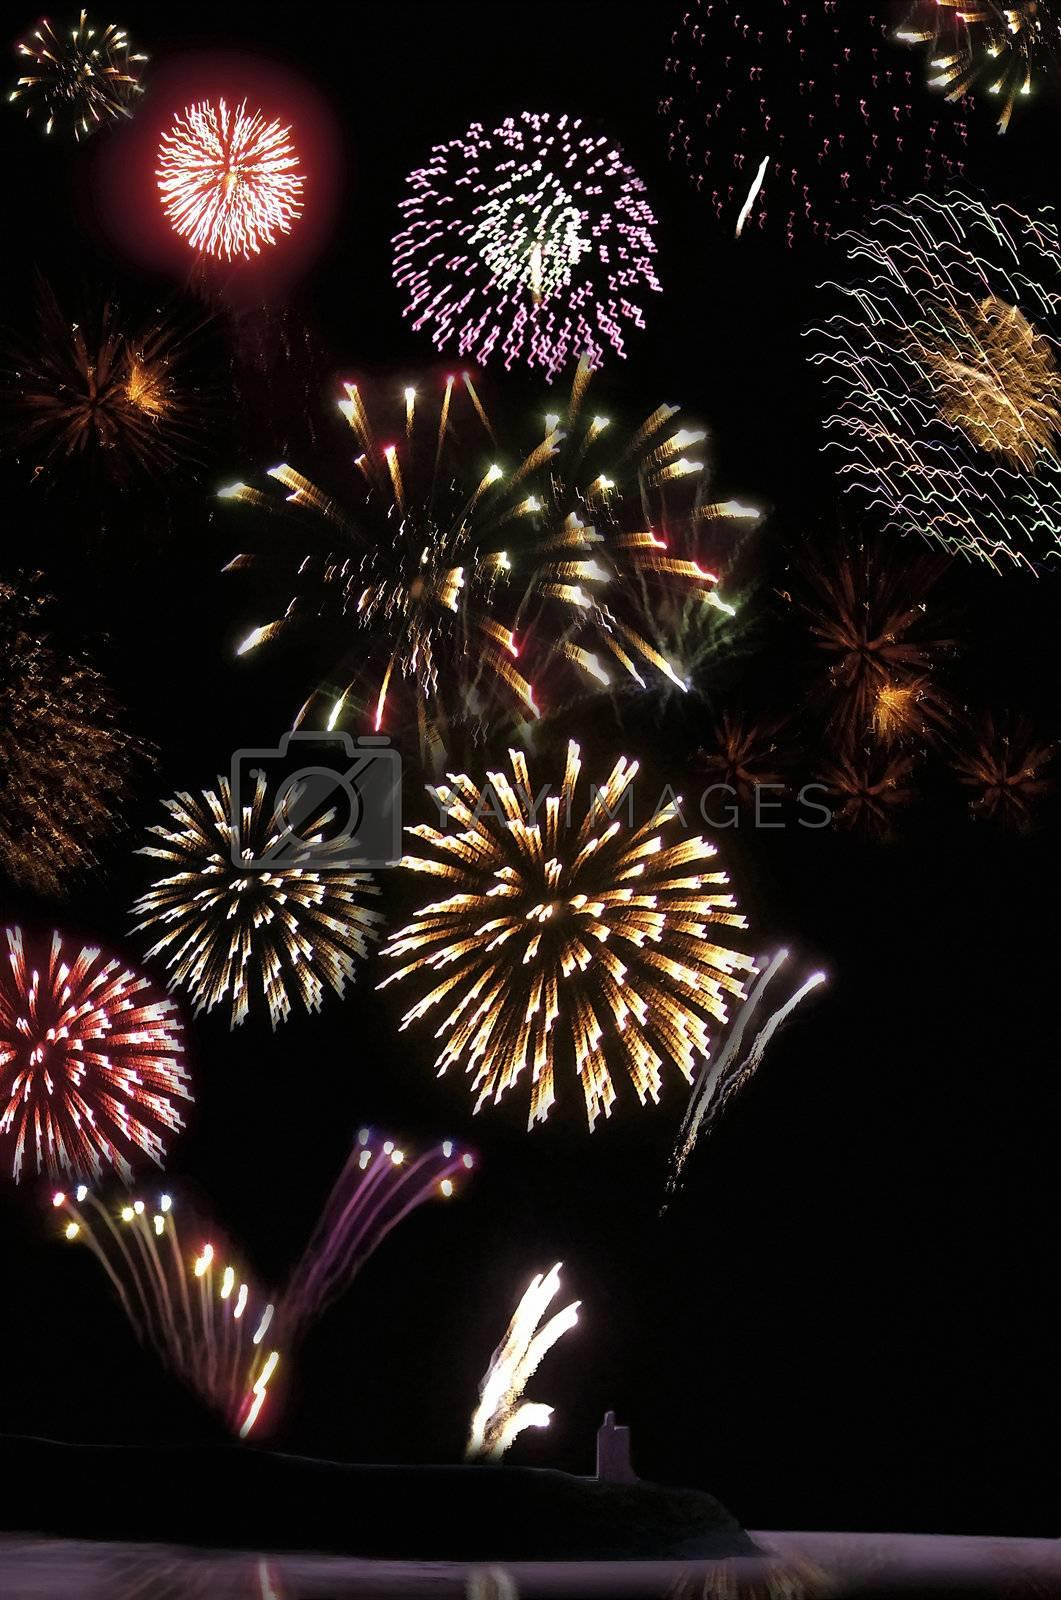 ballybunion ireland new year celebrations